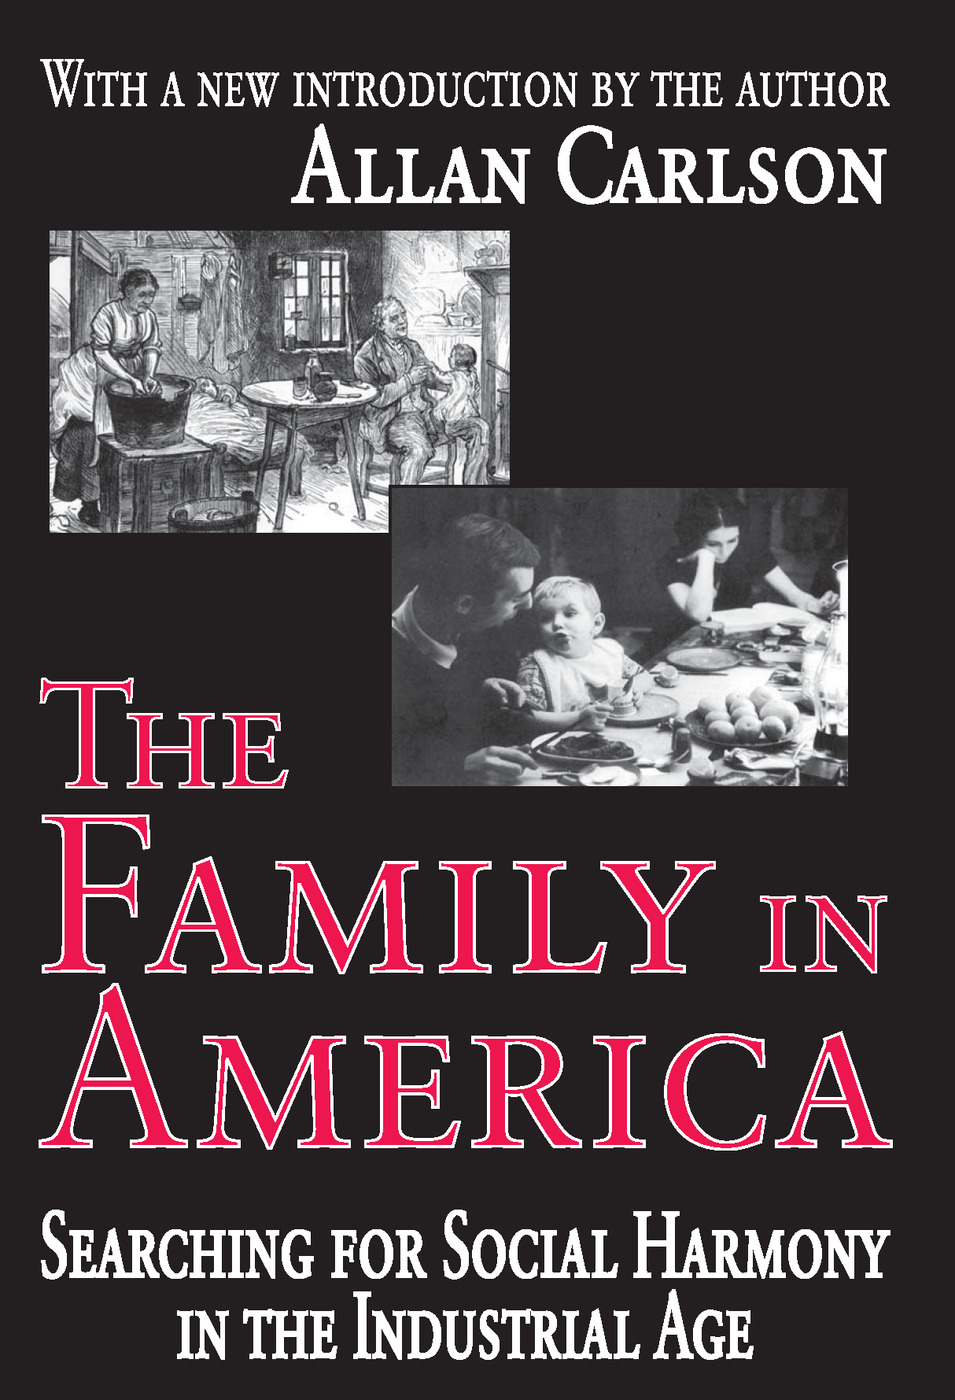 The Family in America